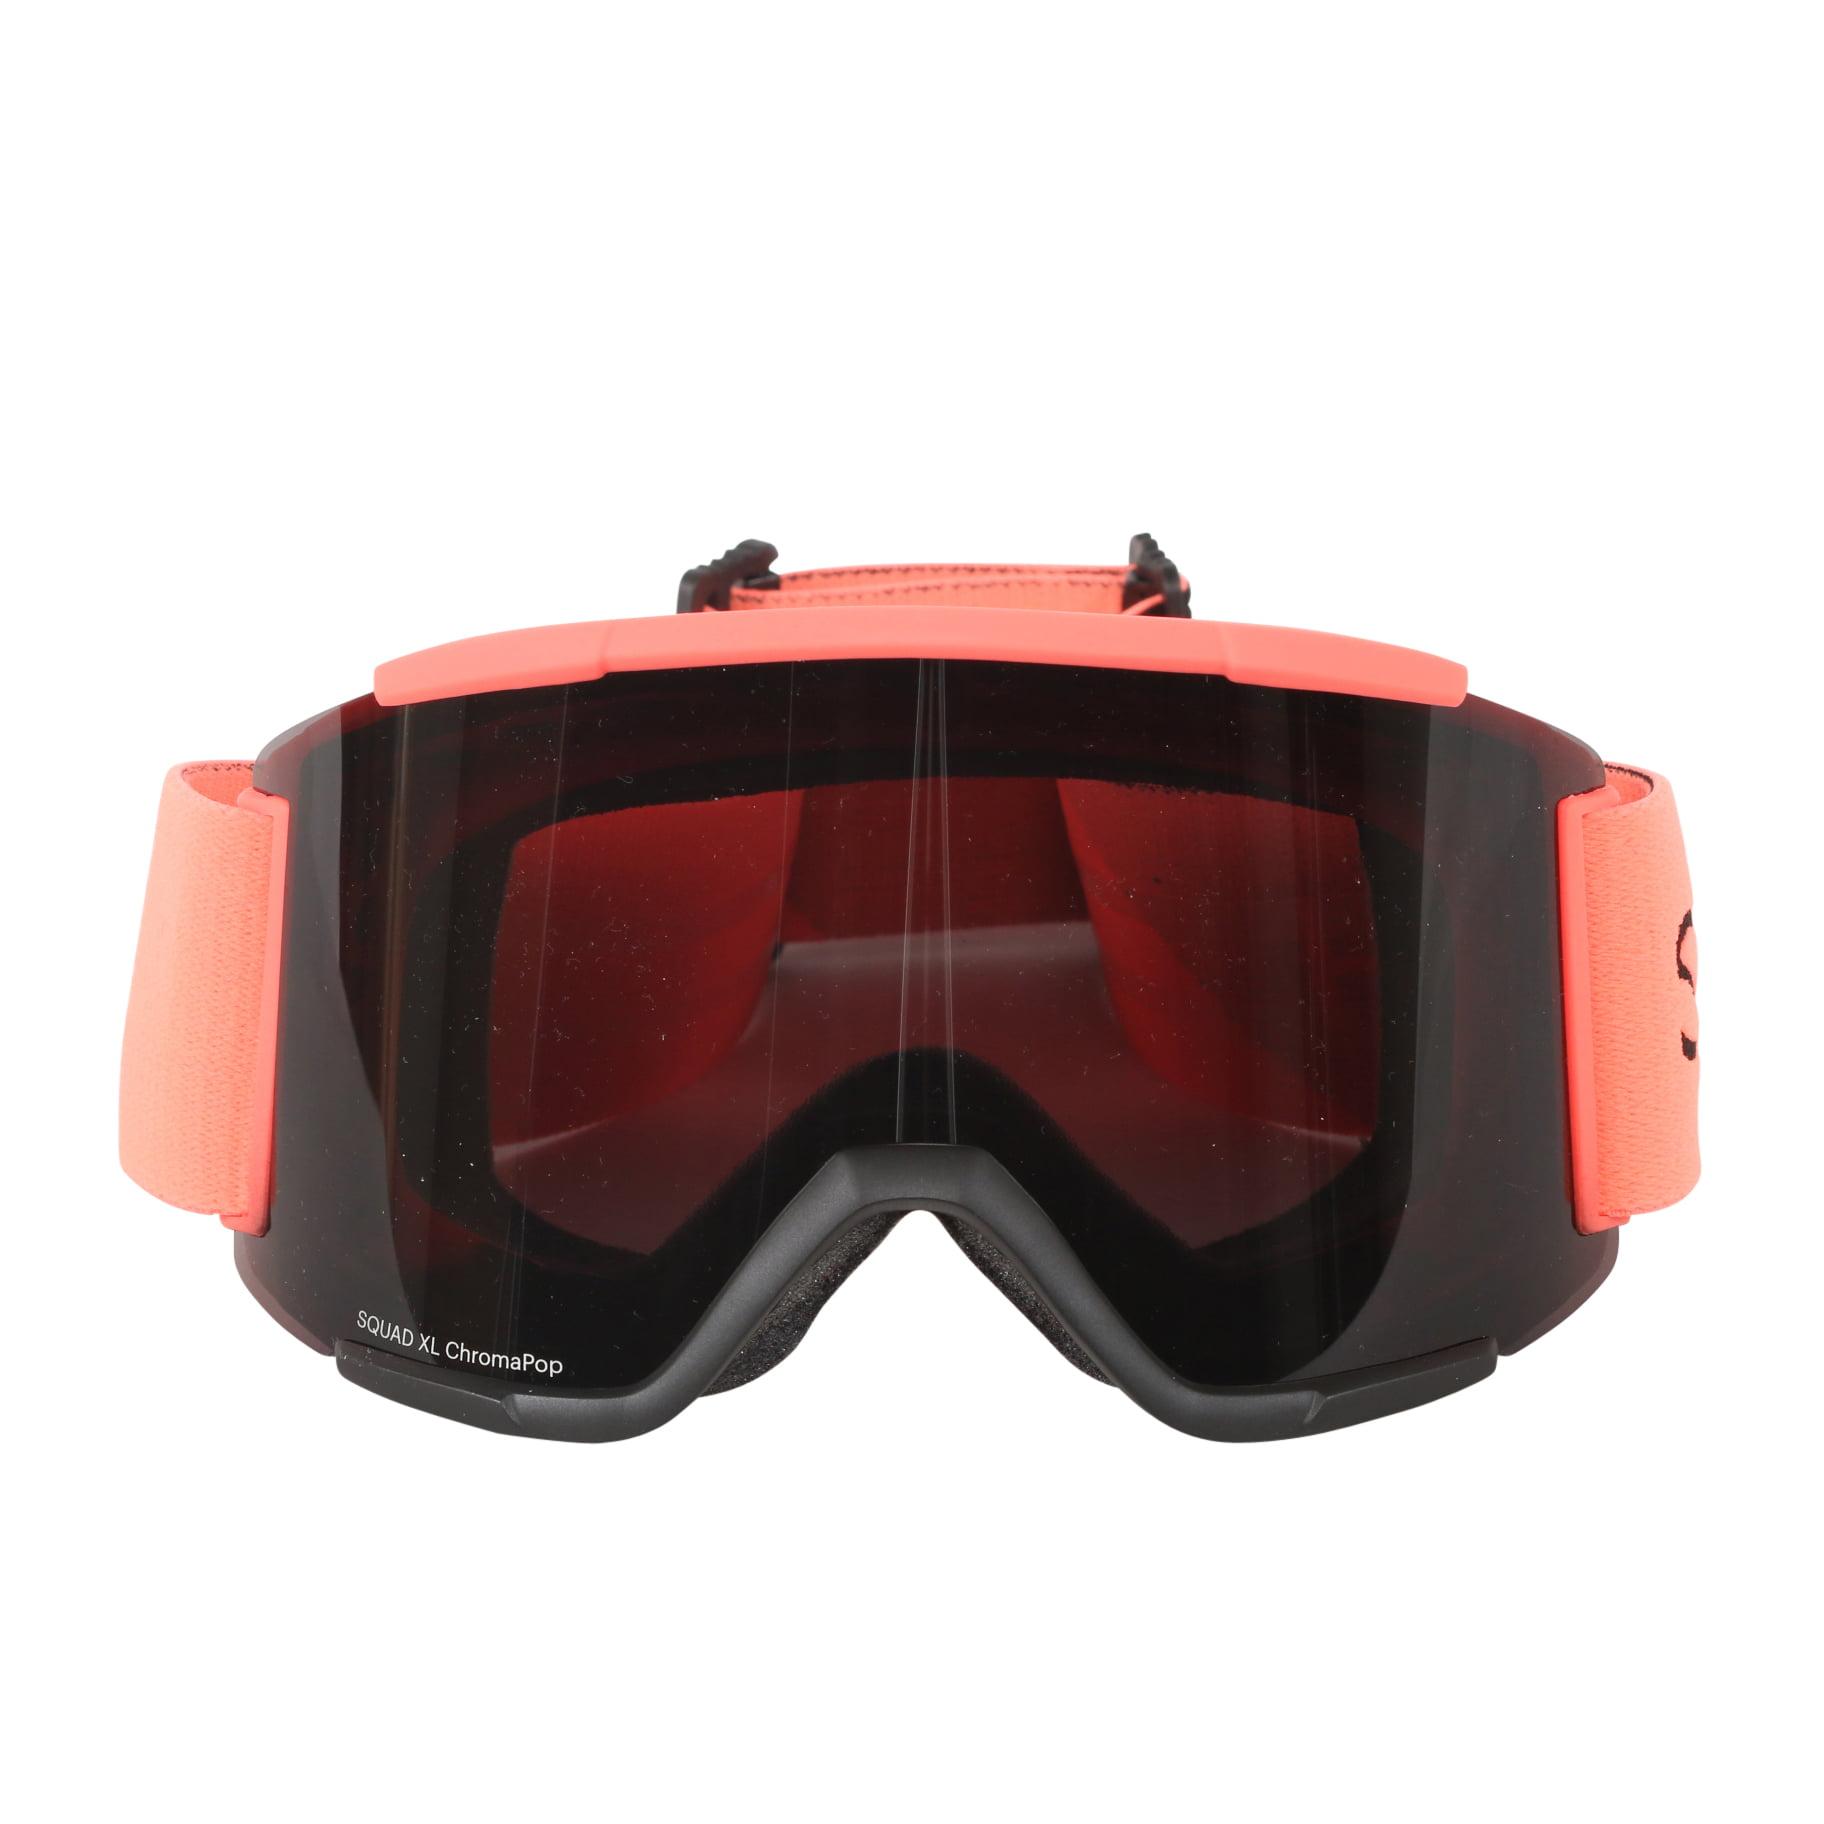 Smith Optics Sunburst Split ChromaPop Sun Squad XL Interchangeable Snow Goggles by Smith Optics